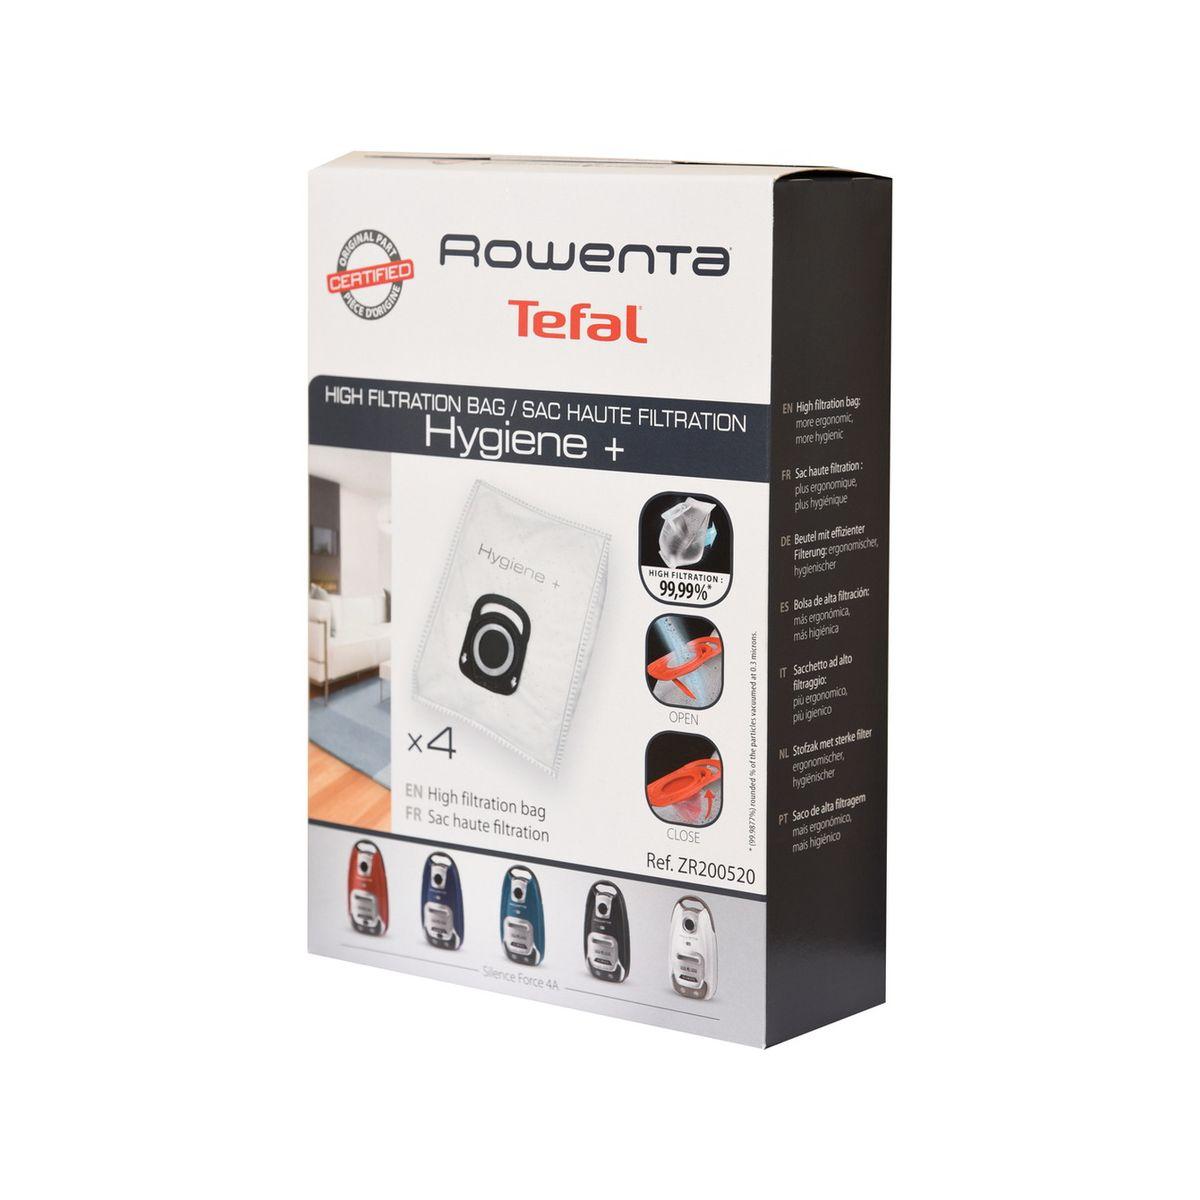 Sac aspirateur ROWENTA 4 sacs haute filtration hygiène +